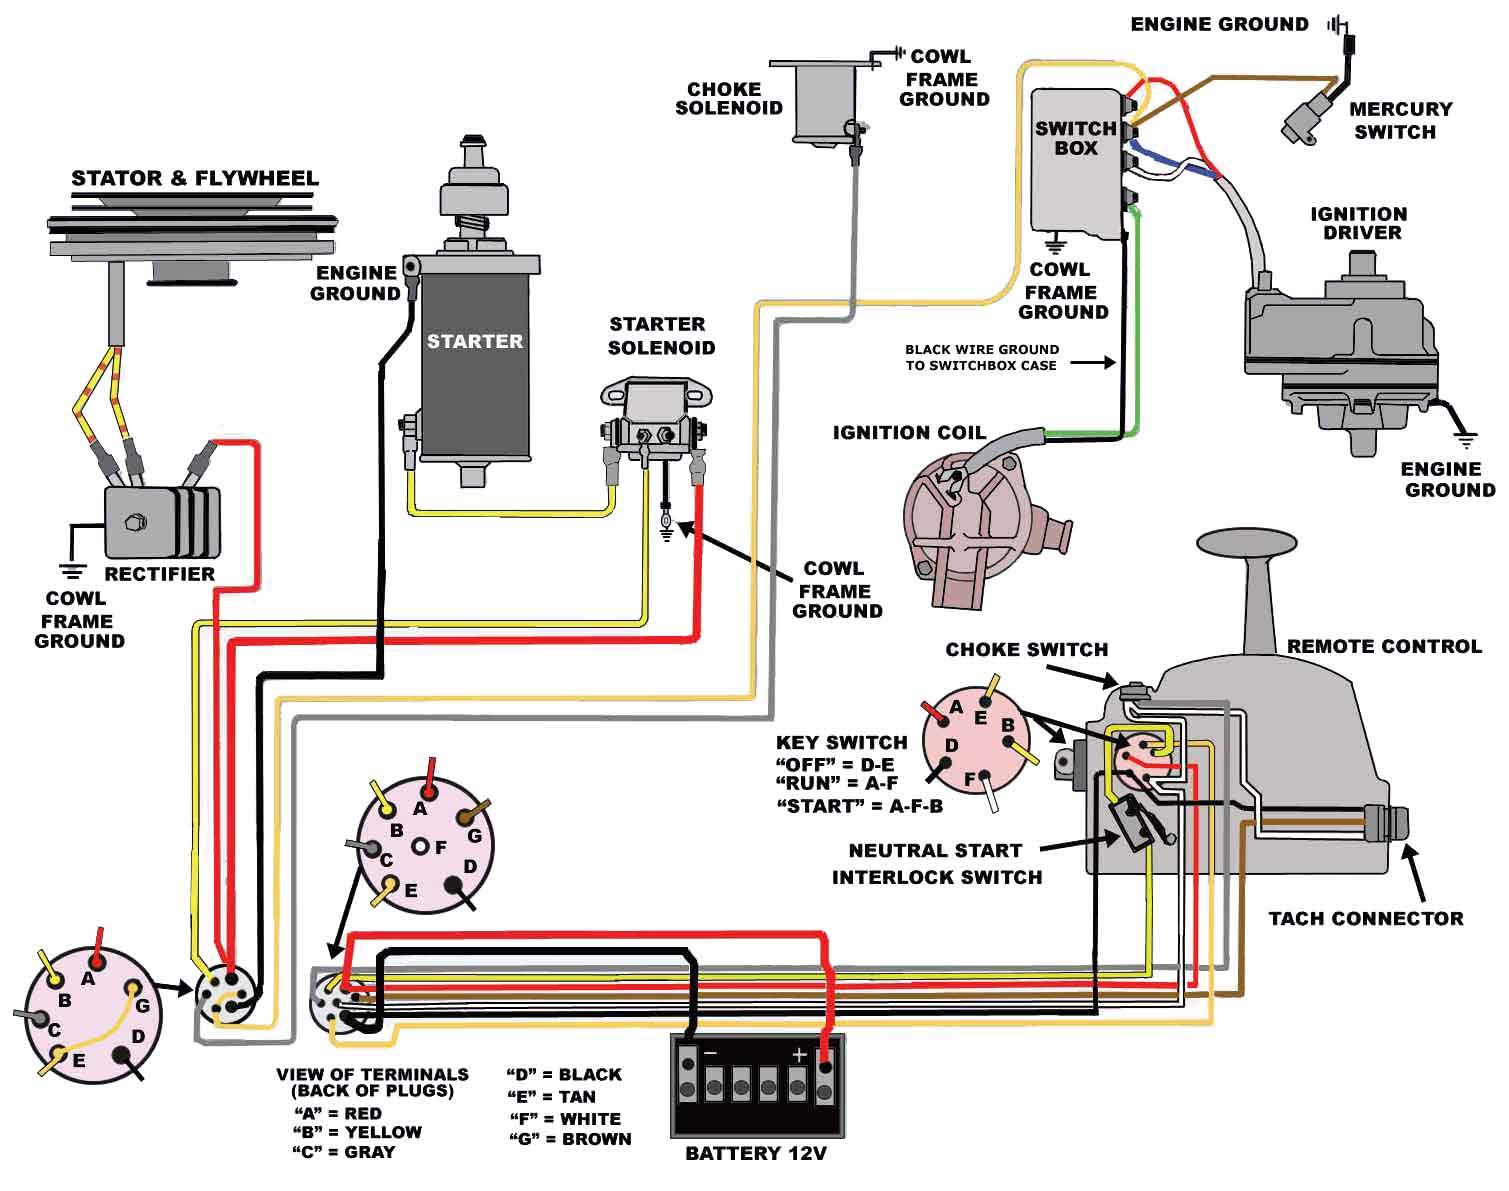 Yh 5944 Tracker Wiring Diagram Starter